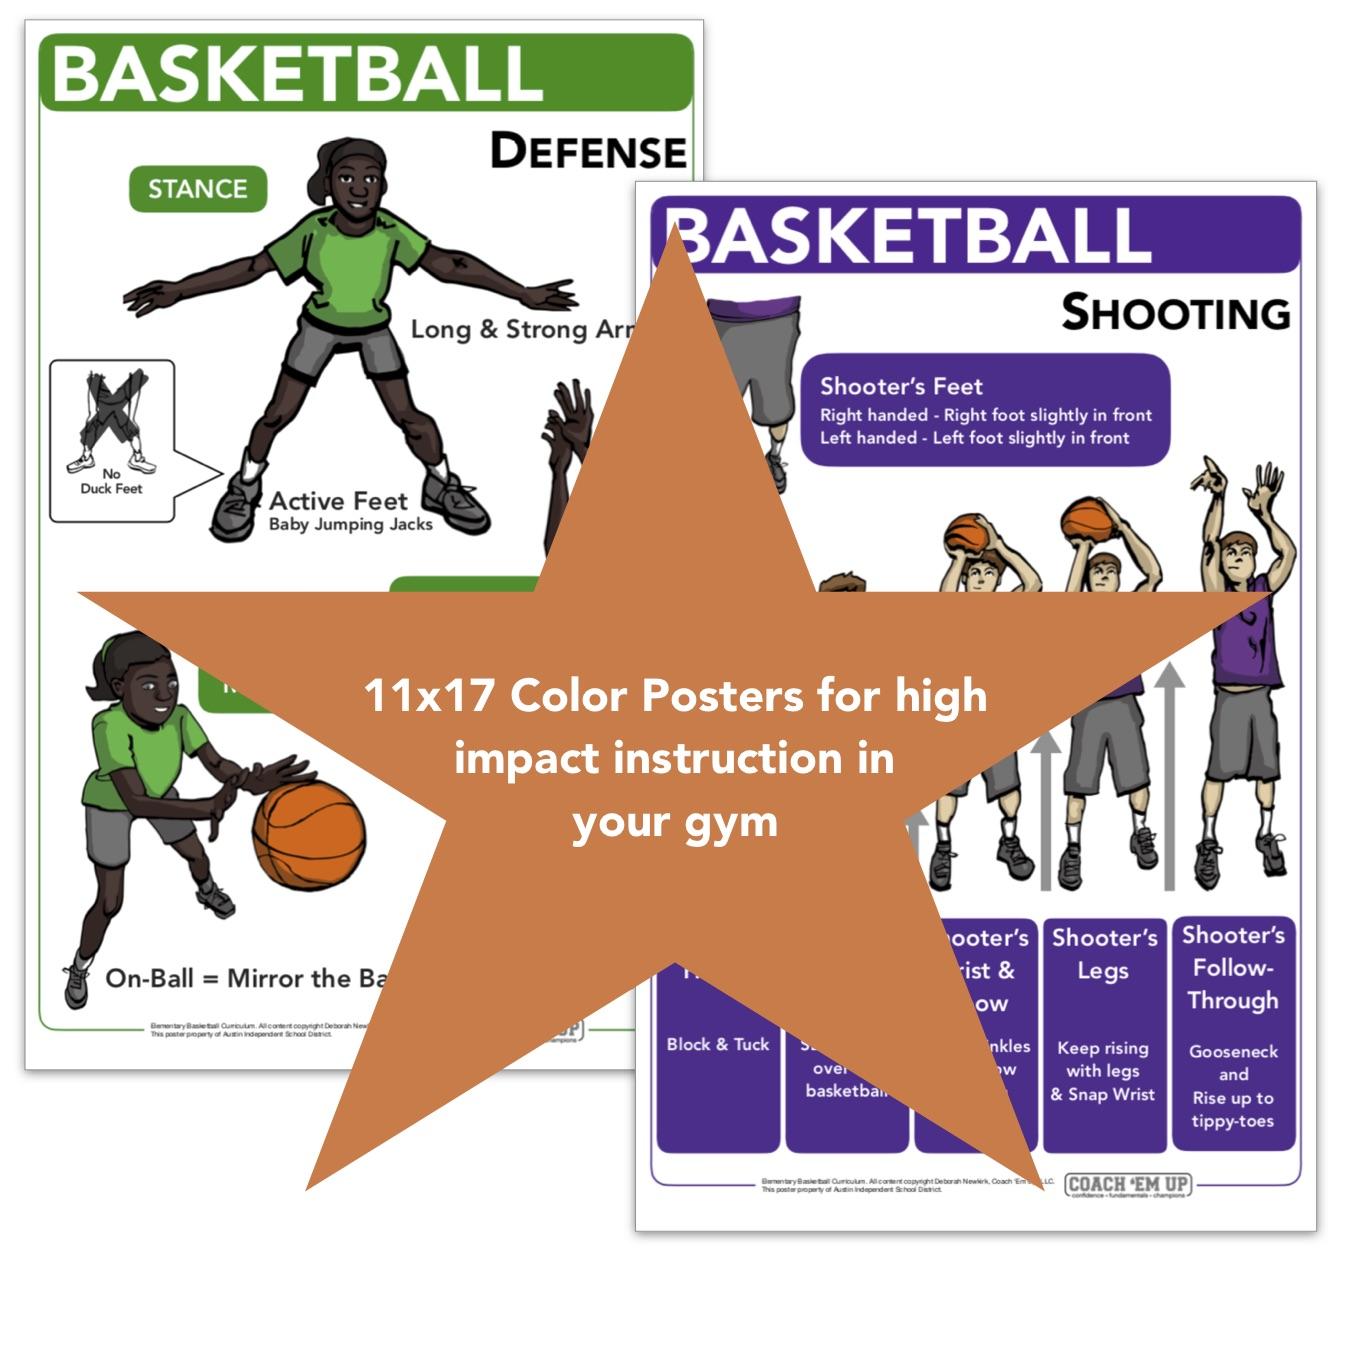 Coach Em Up Elementary Basketball Curriculum For School